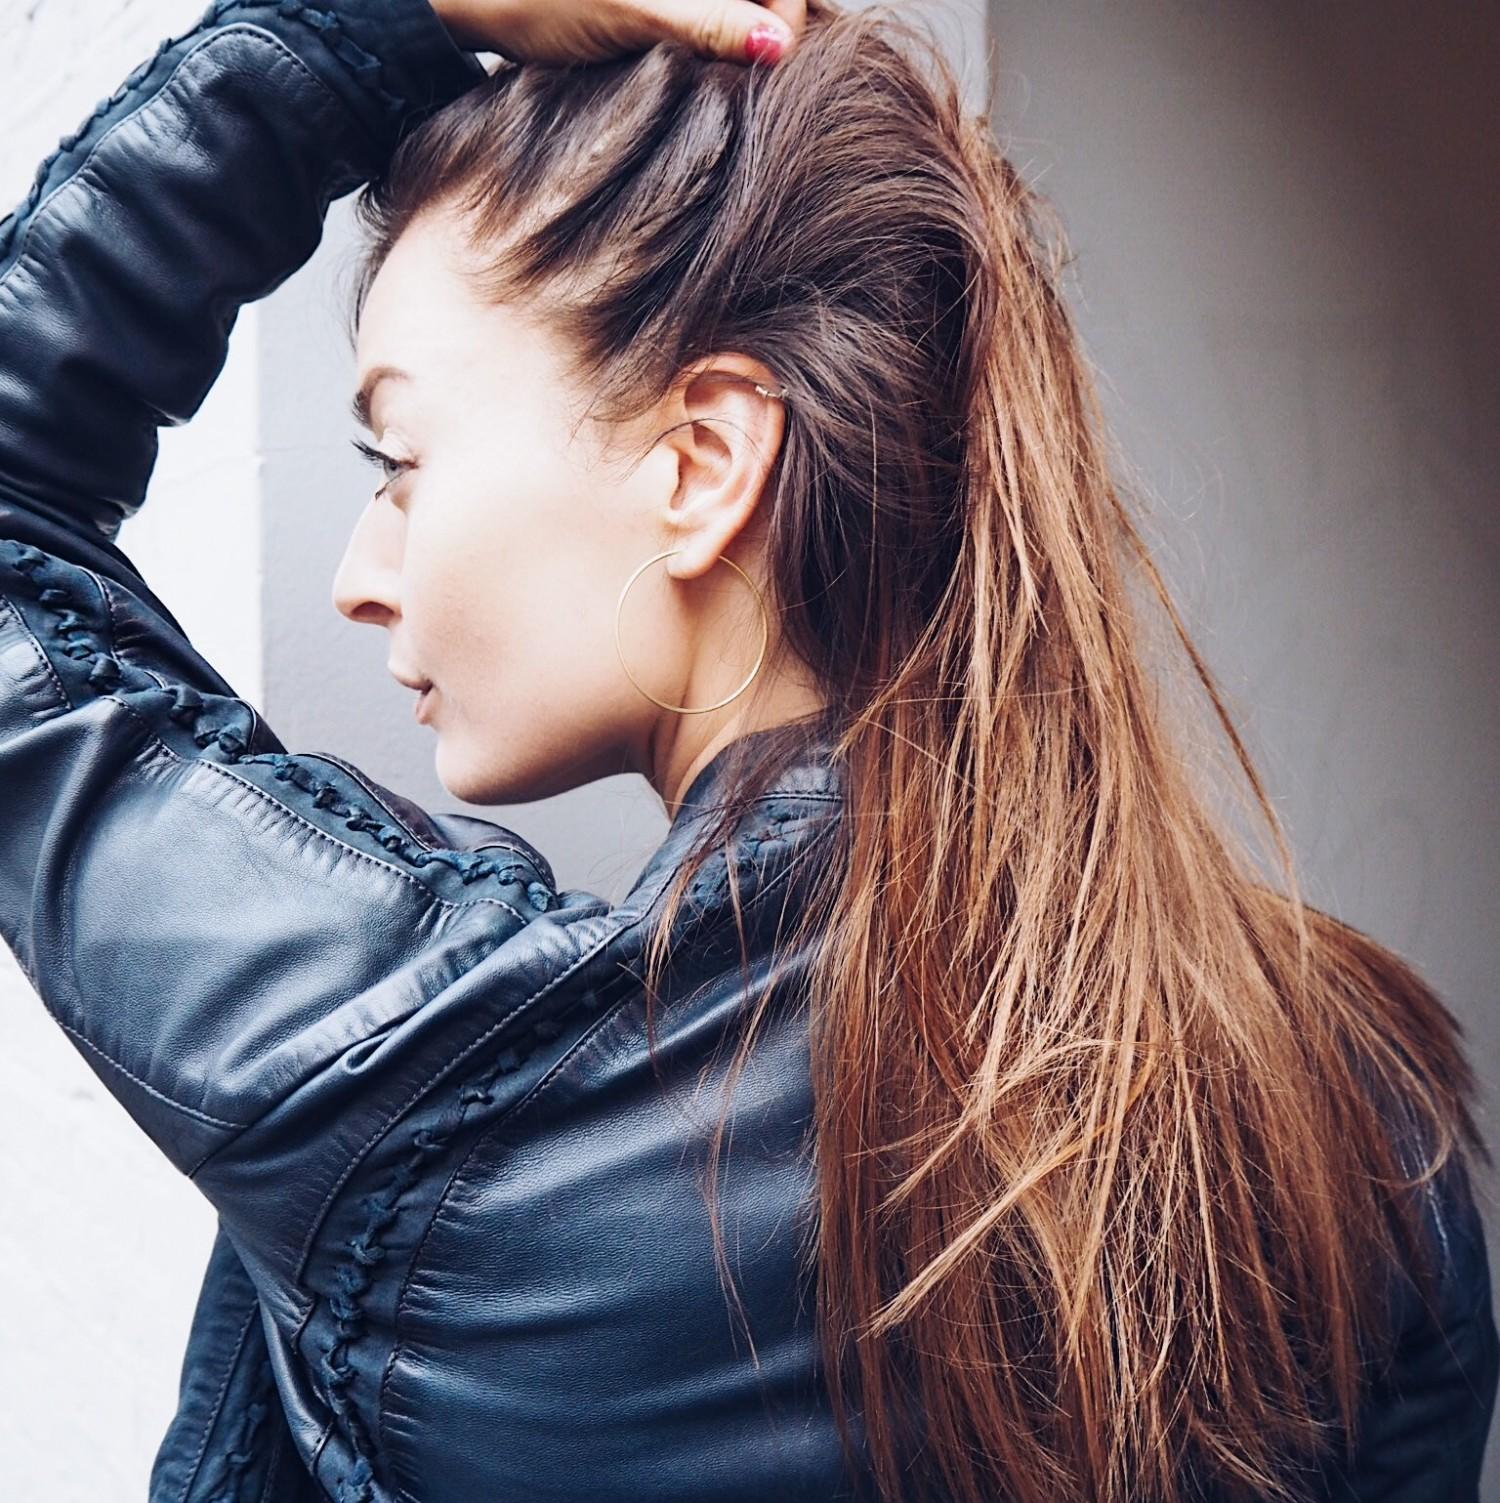 den gode uge nelle noell nyt hår nyt gulv og nyt indkøb